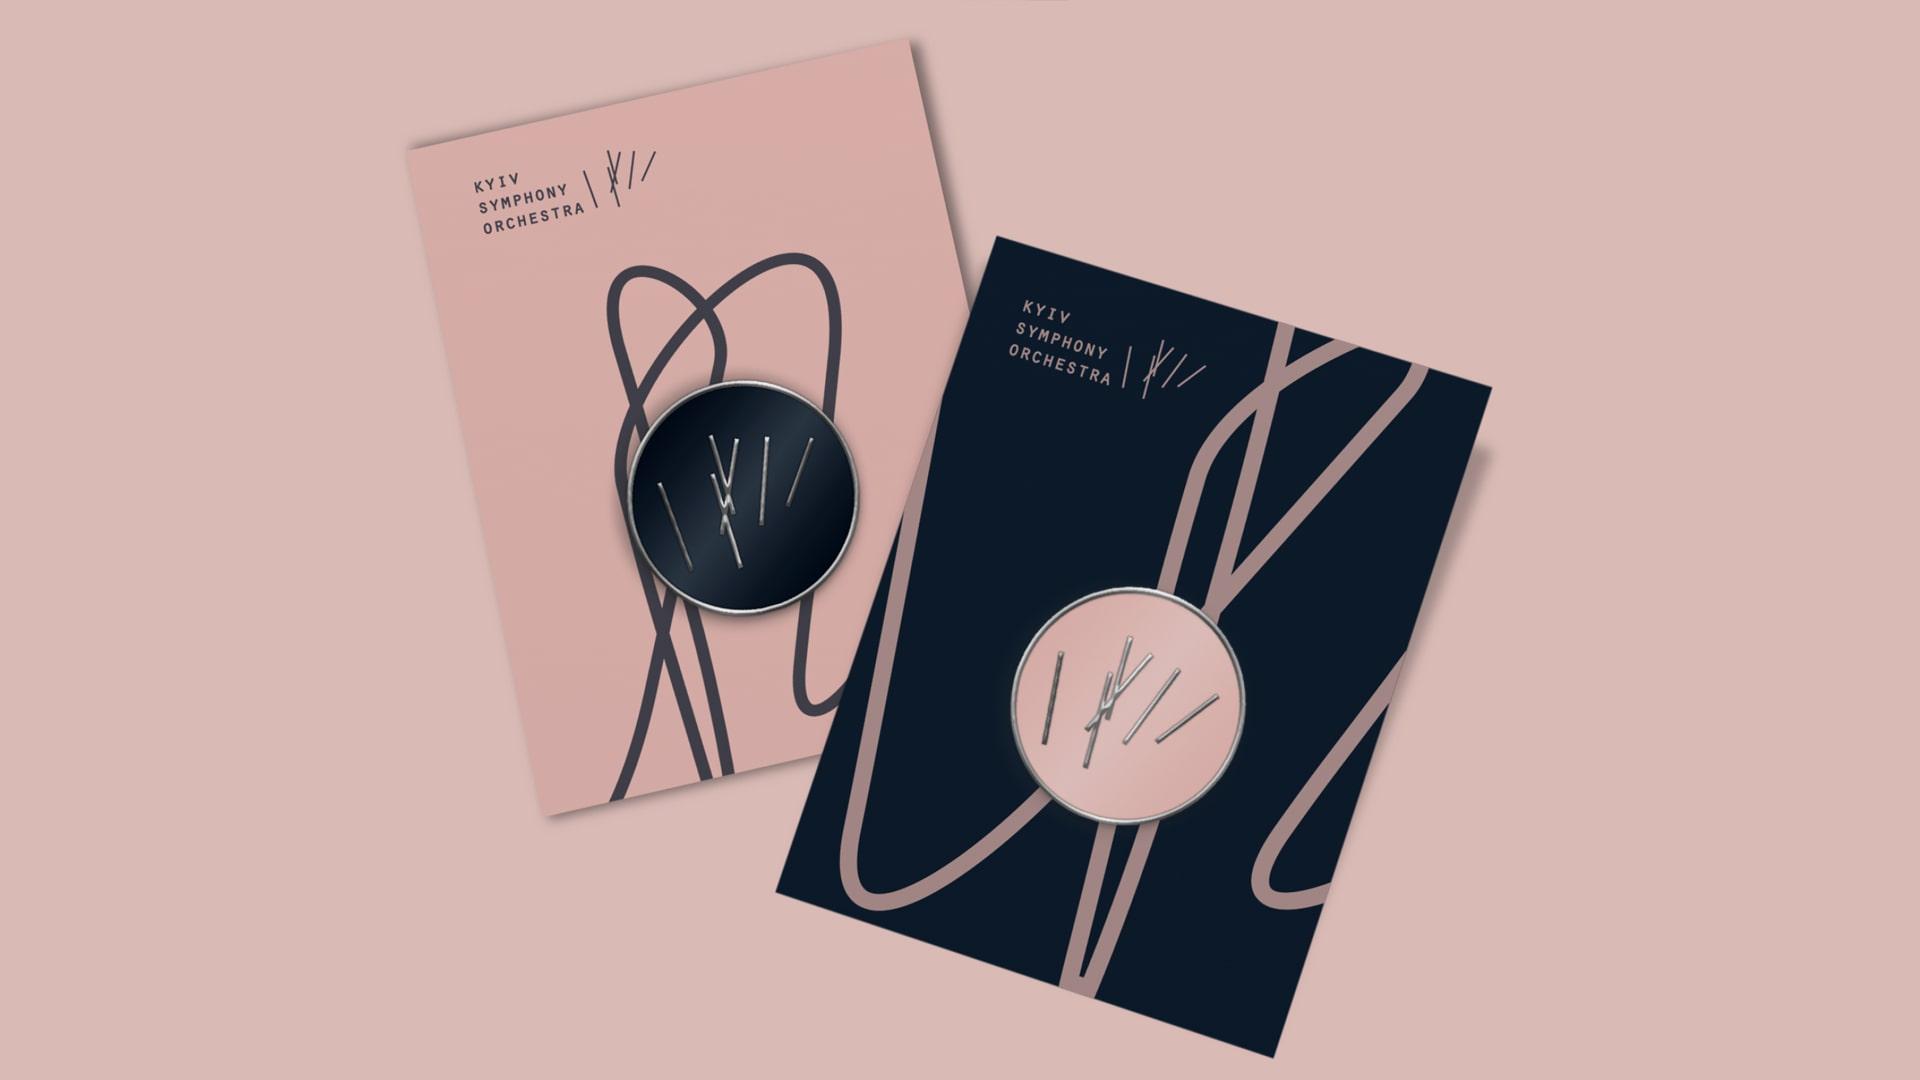 gra brand design kyivsymphony 5